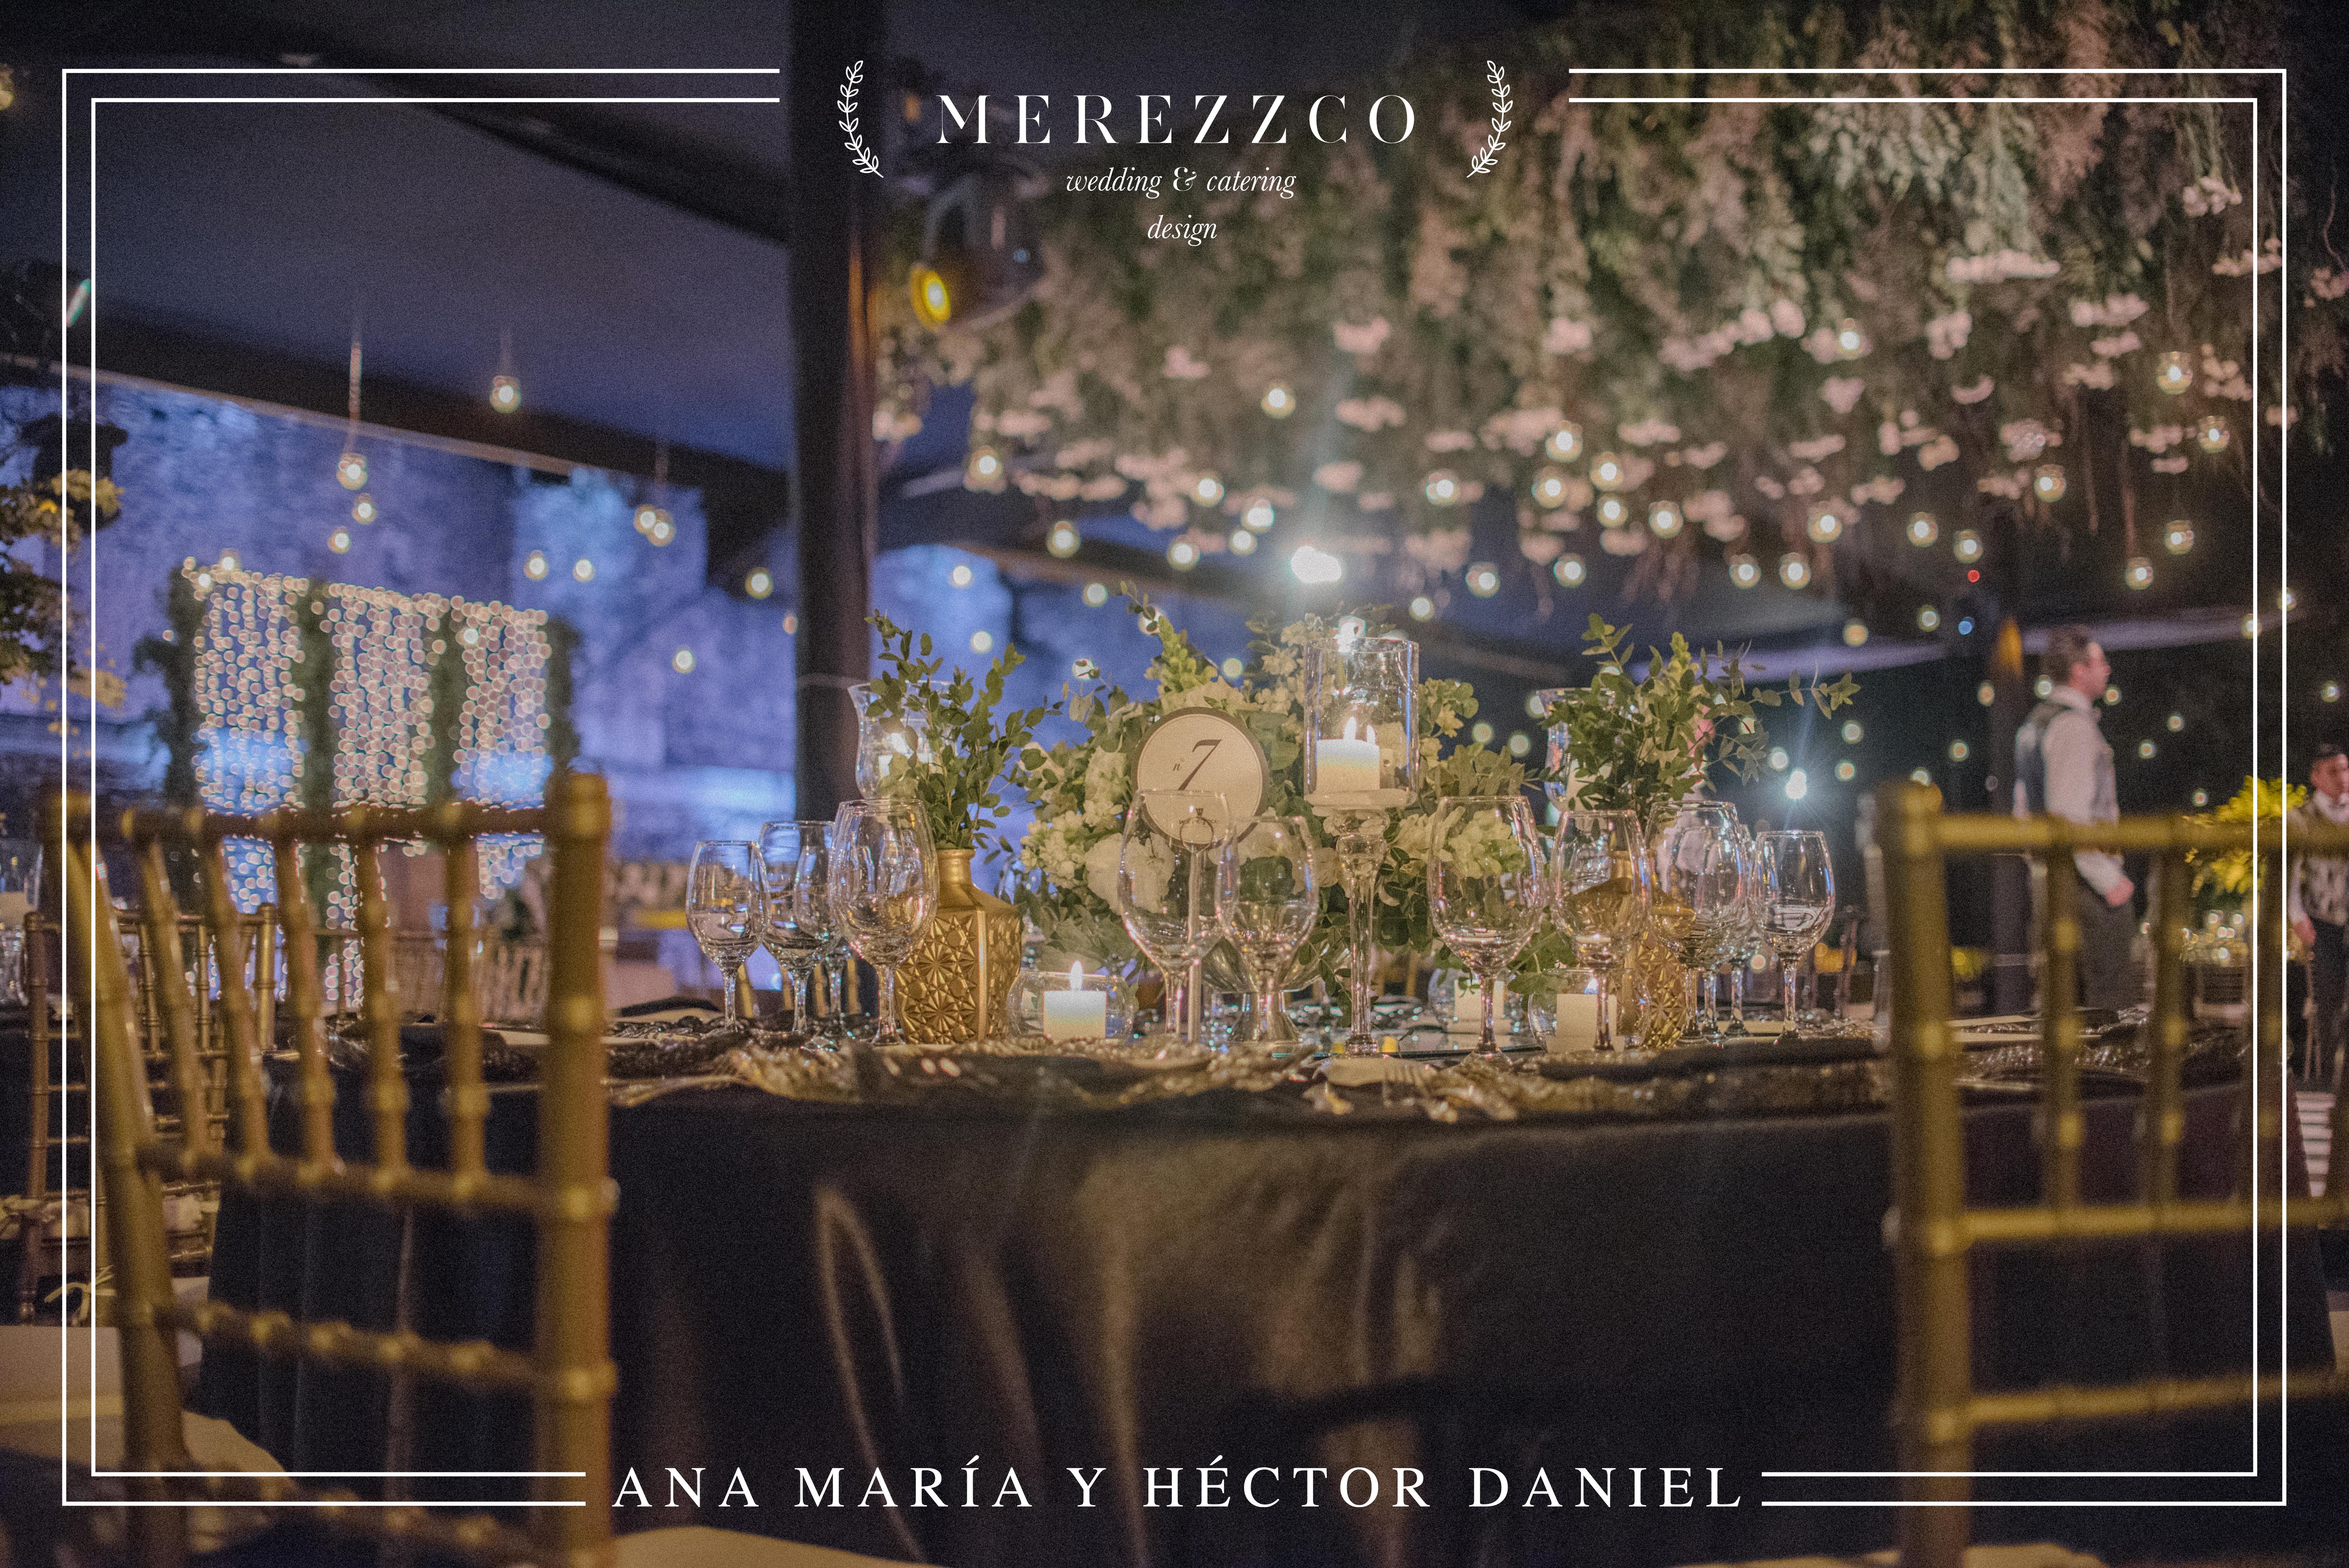 ANA MARÍA Y HÉCTOR DANIEL